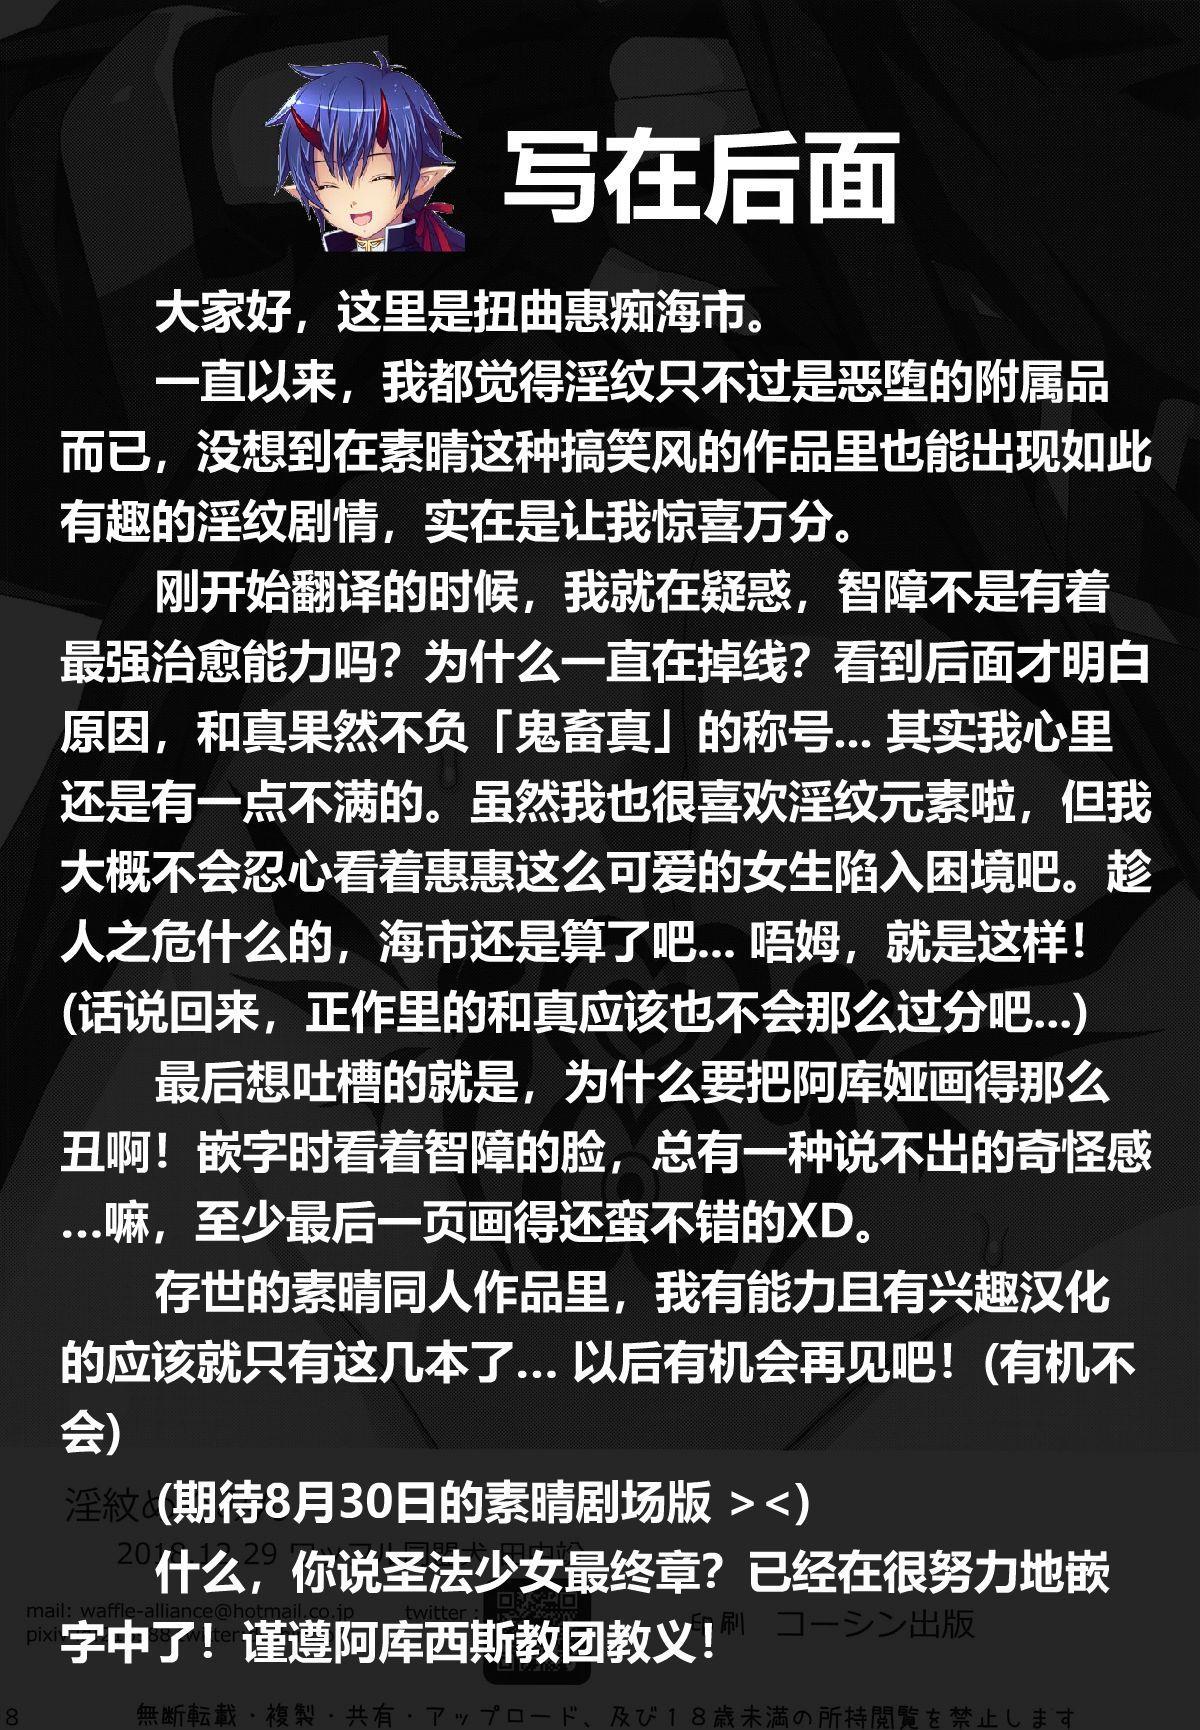 [Waffle Doumeiken (Tanaka Decilitre)] Inmon Megumin - Crotch Tattoo Megumin! (Kono Subarashii Sekai ni Syukufuku o!) [Chinese] [海市个人汉化]] 17